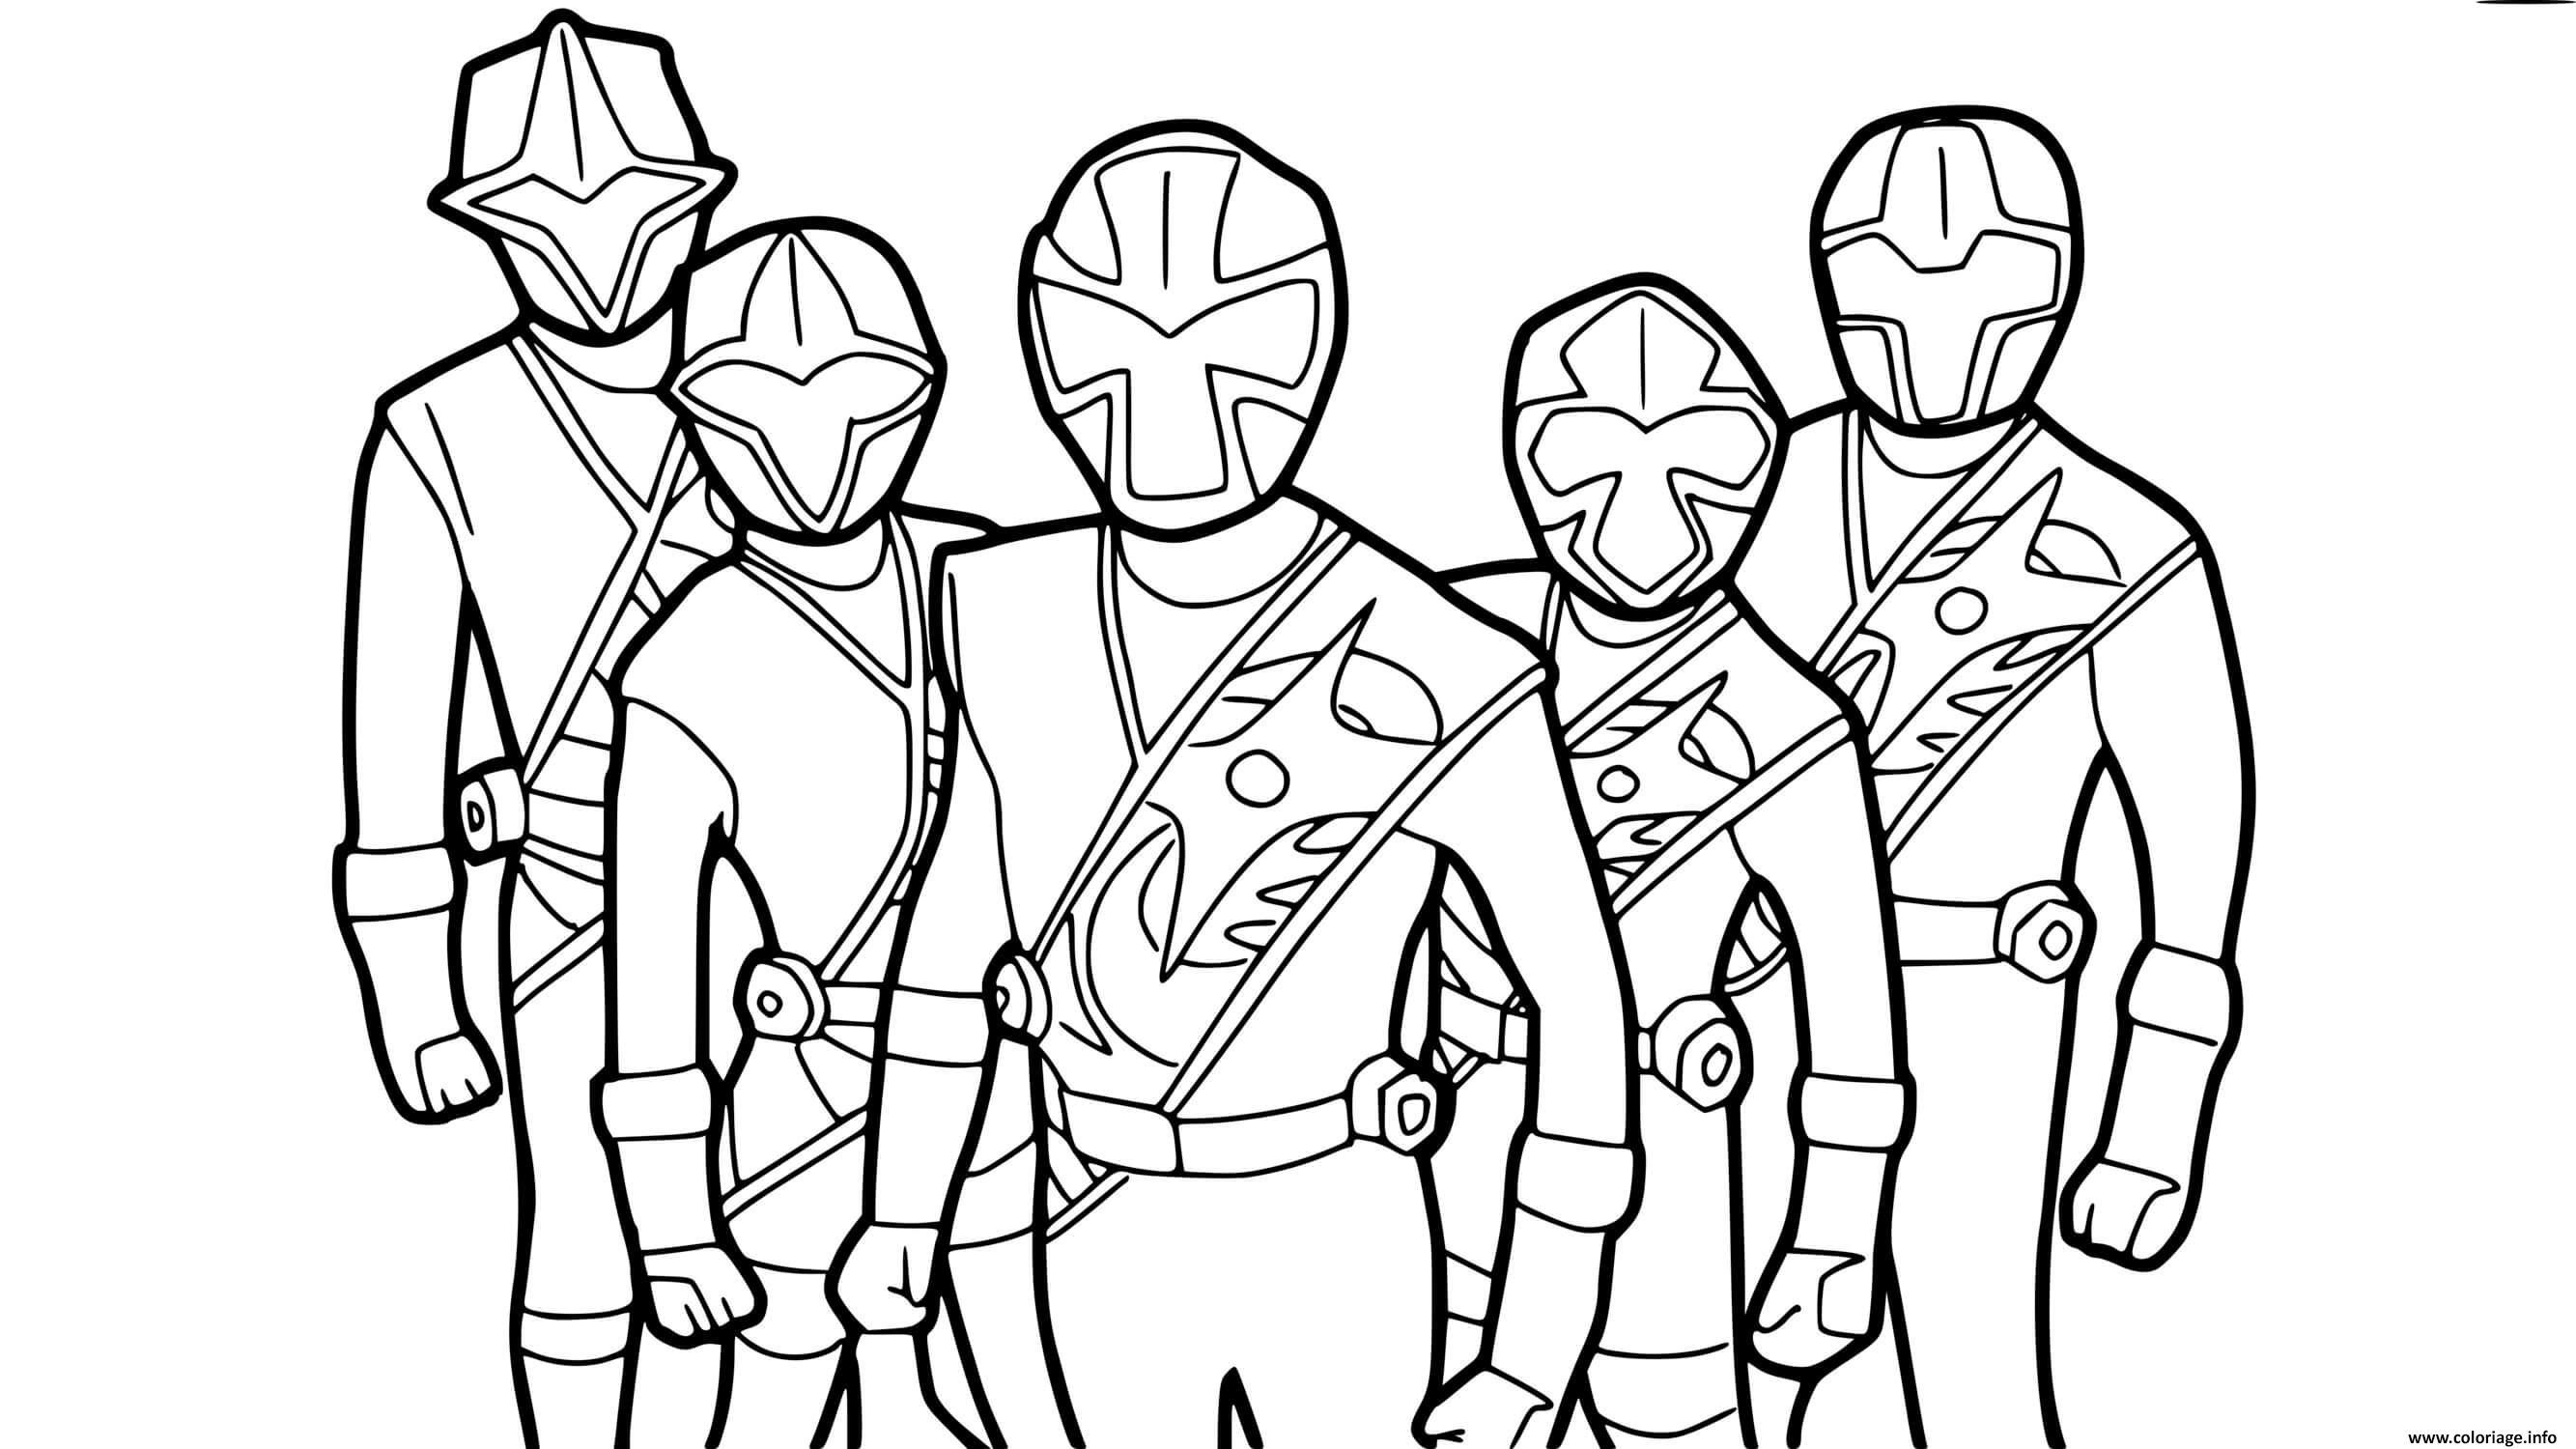 Dessin ninja steel power rangers Coloriage Gratuit à Imprimer